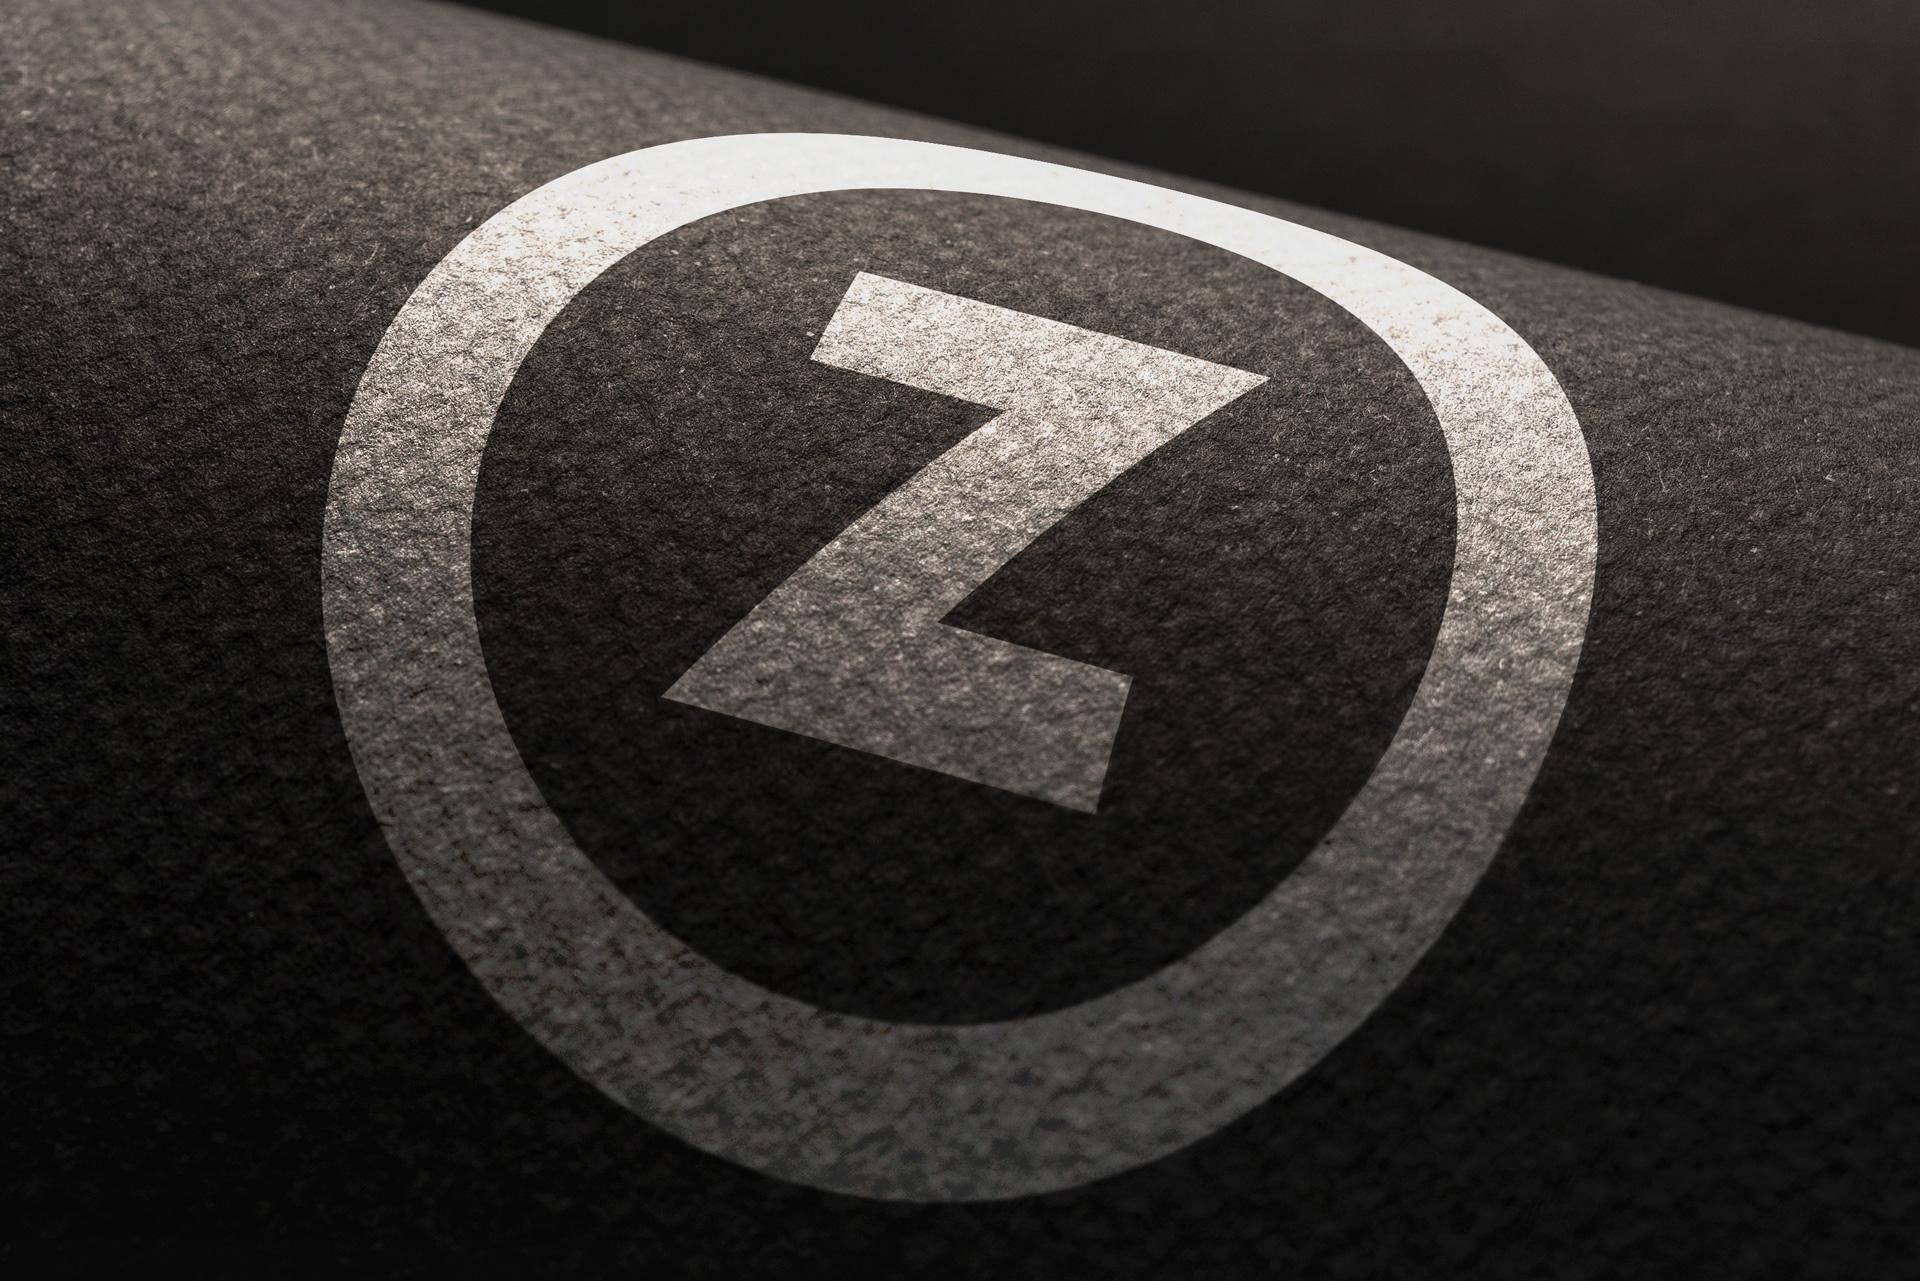 patrick-sanders-portfolio-graphic-design-zen-fitness-yoga-mat.jpg